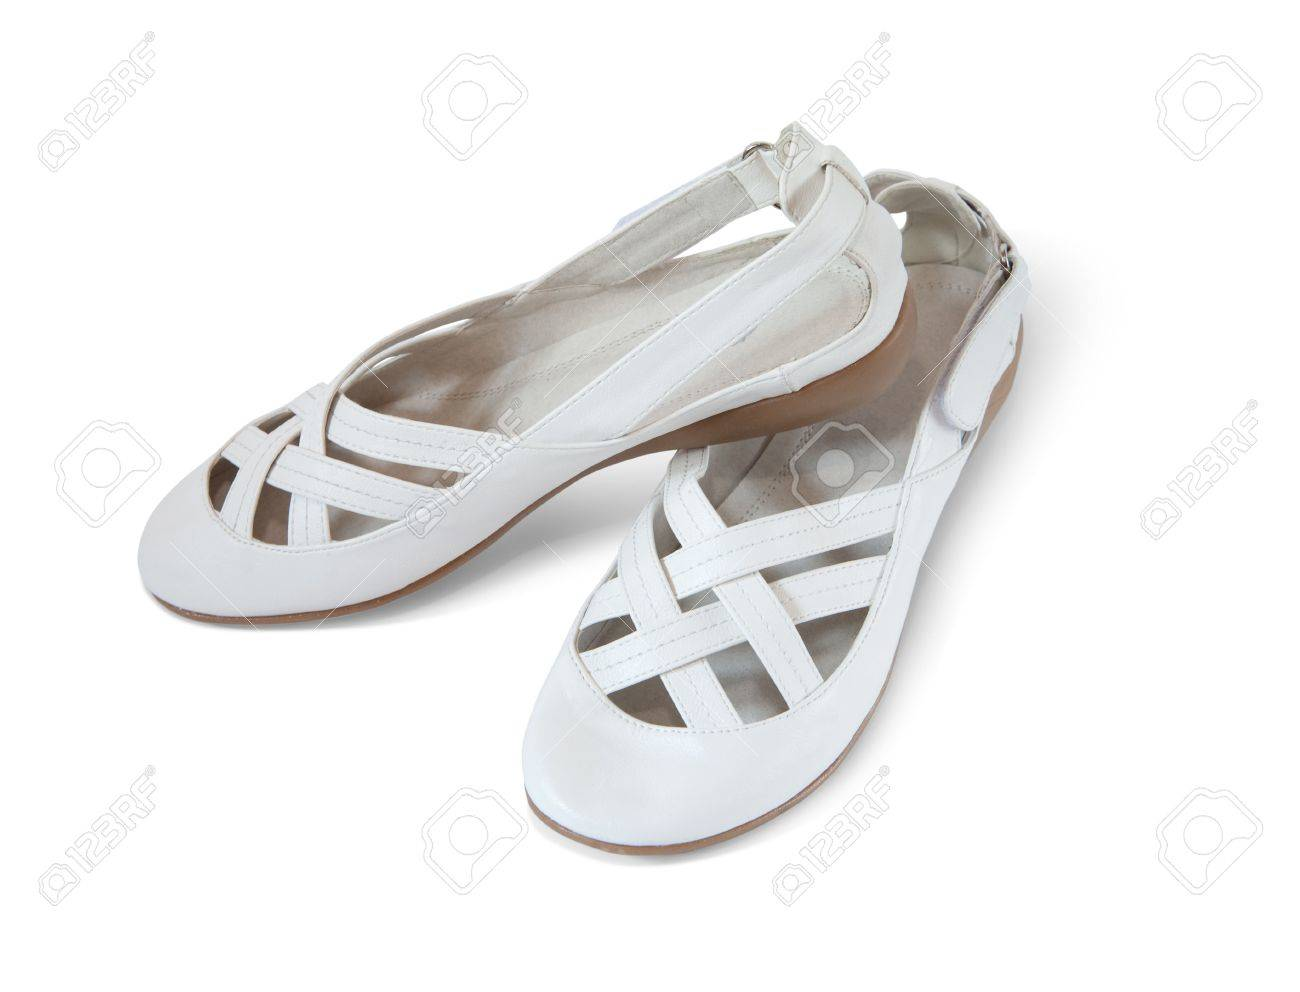 White woman shoes Stock Photo - 5425584